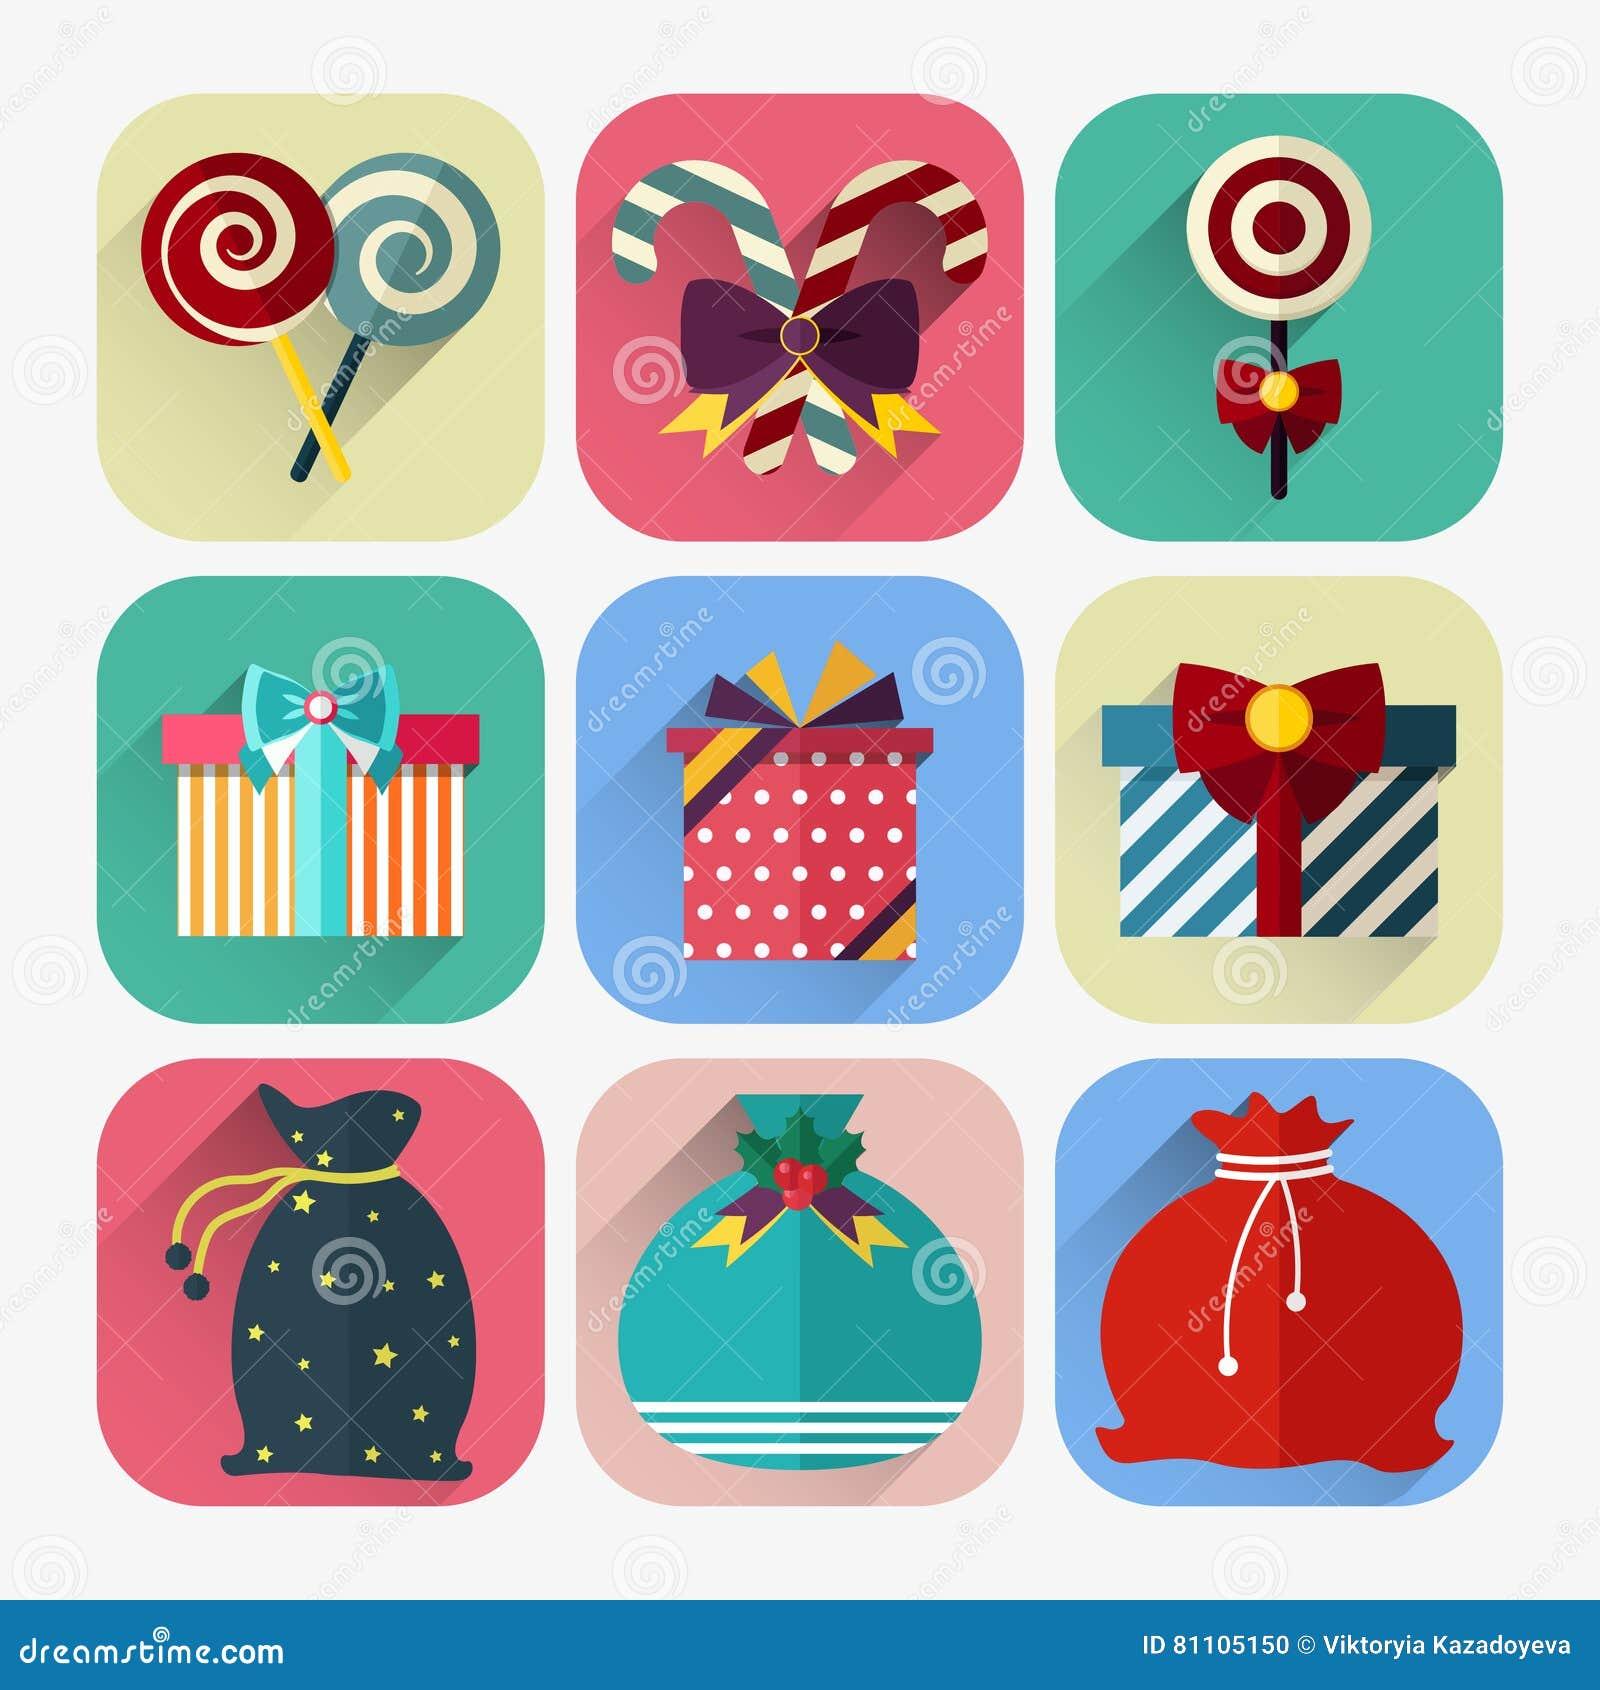 Комплект значка Нового Года плоский подарка рождества, сумки Санта Клауса и леденца на палочке